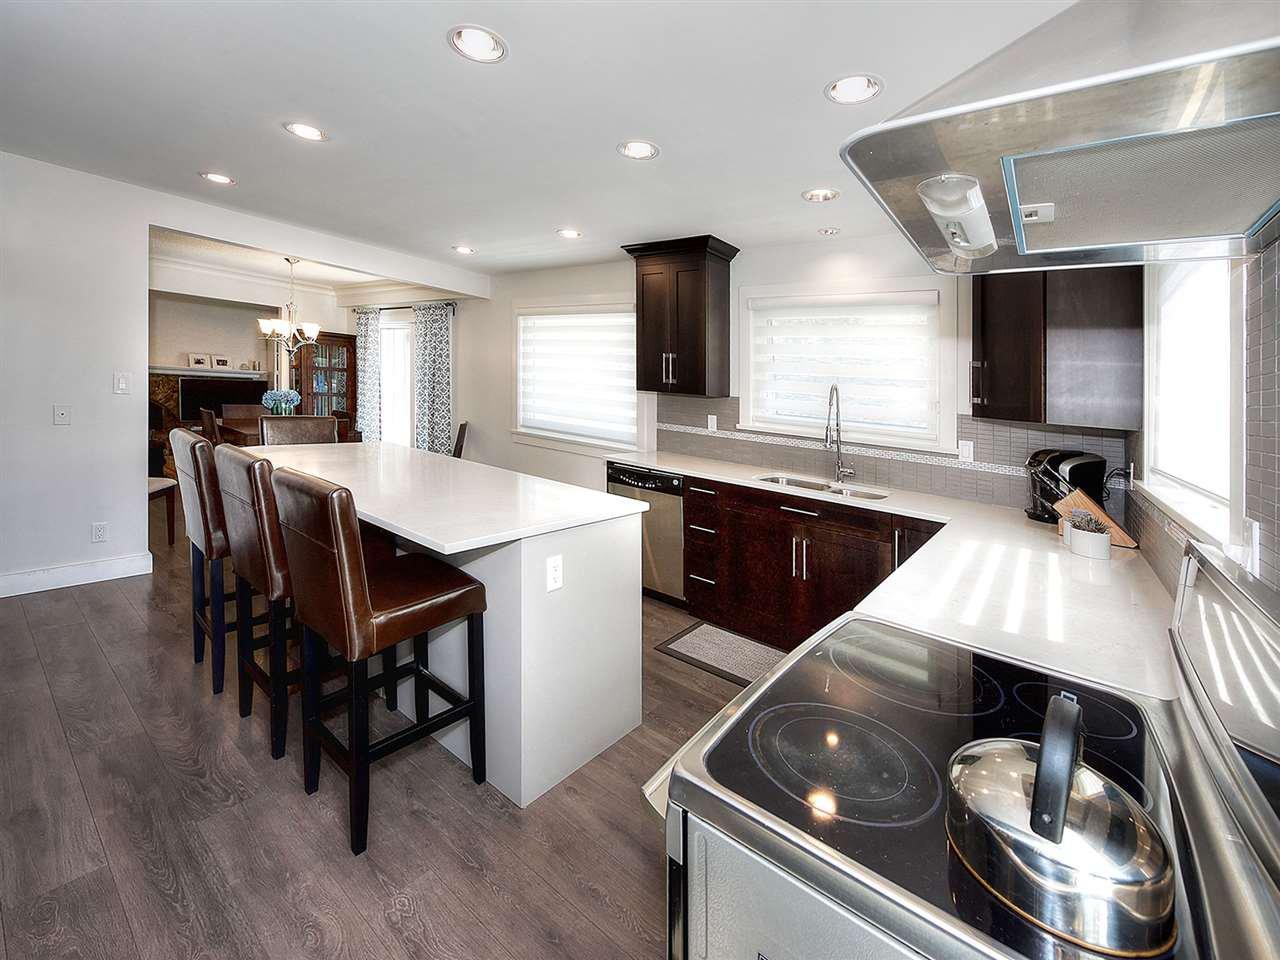 Photo 8: Photos: 1067 WILMINGTON Drive in Delta: Tsawwassen Central House for sale (Tsawwassen)  : MLS®# R2090180